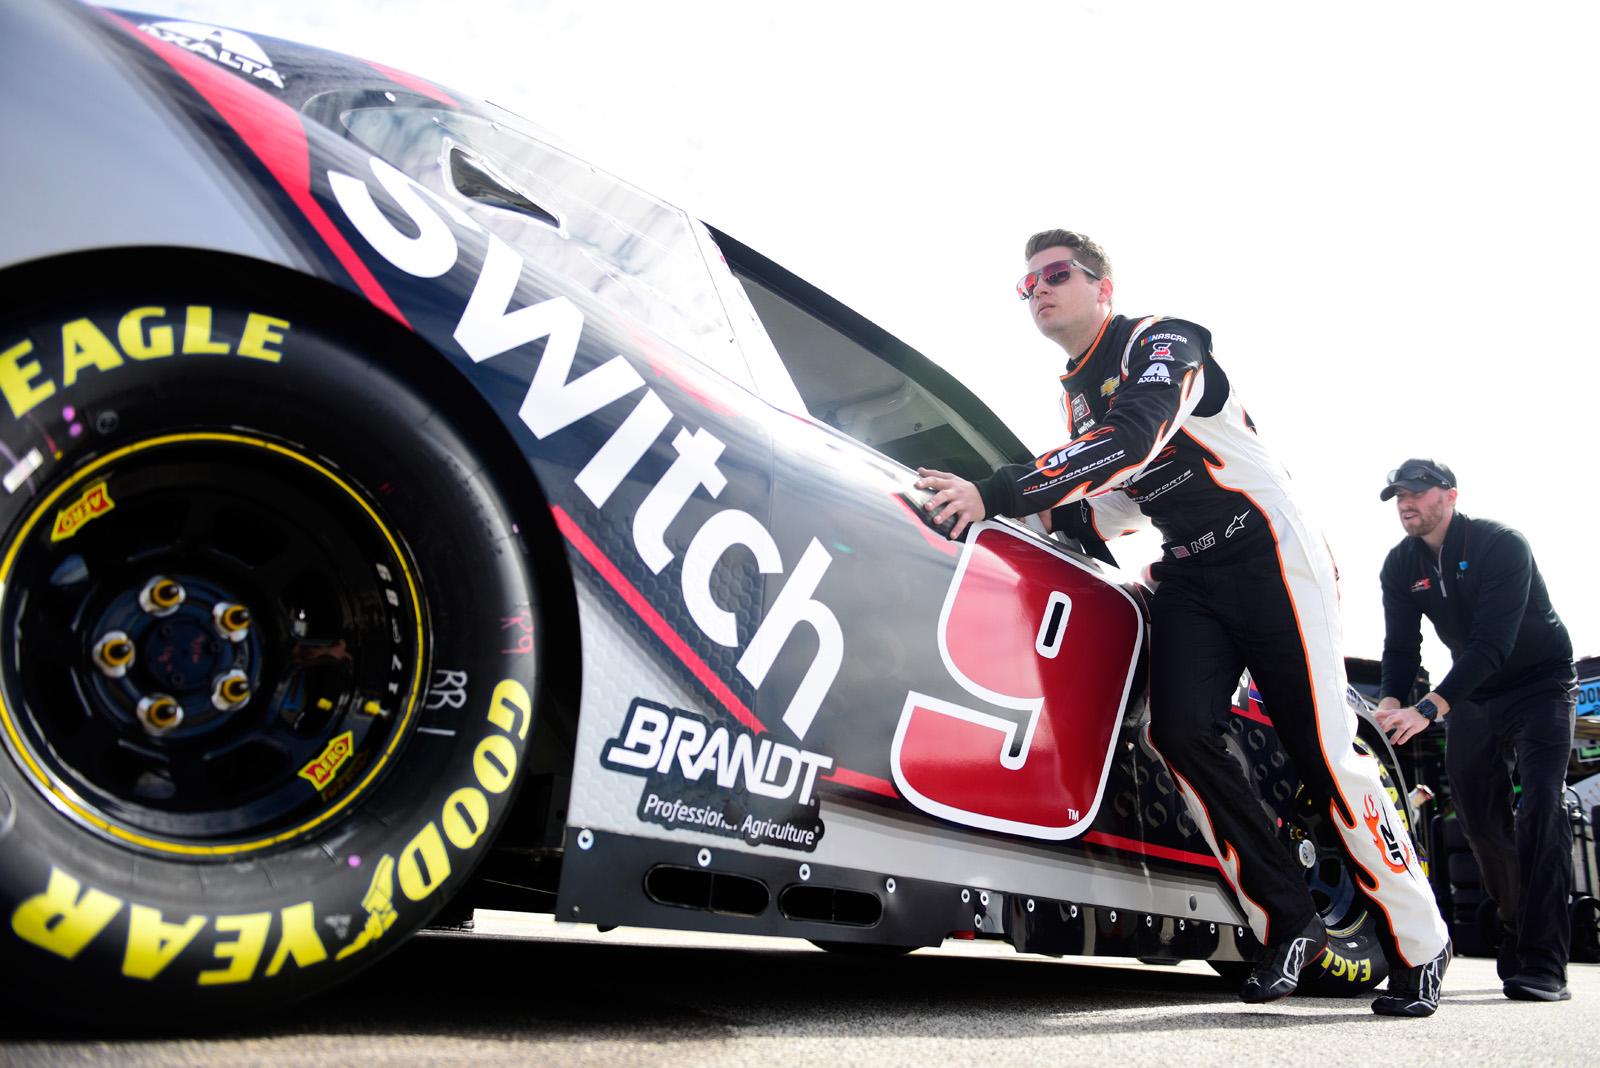 NASCAR Xfinity Series NASCAR Racing Experience 300 – Practice